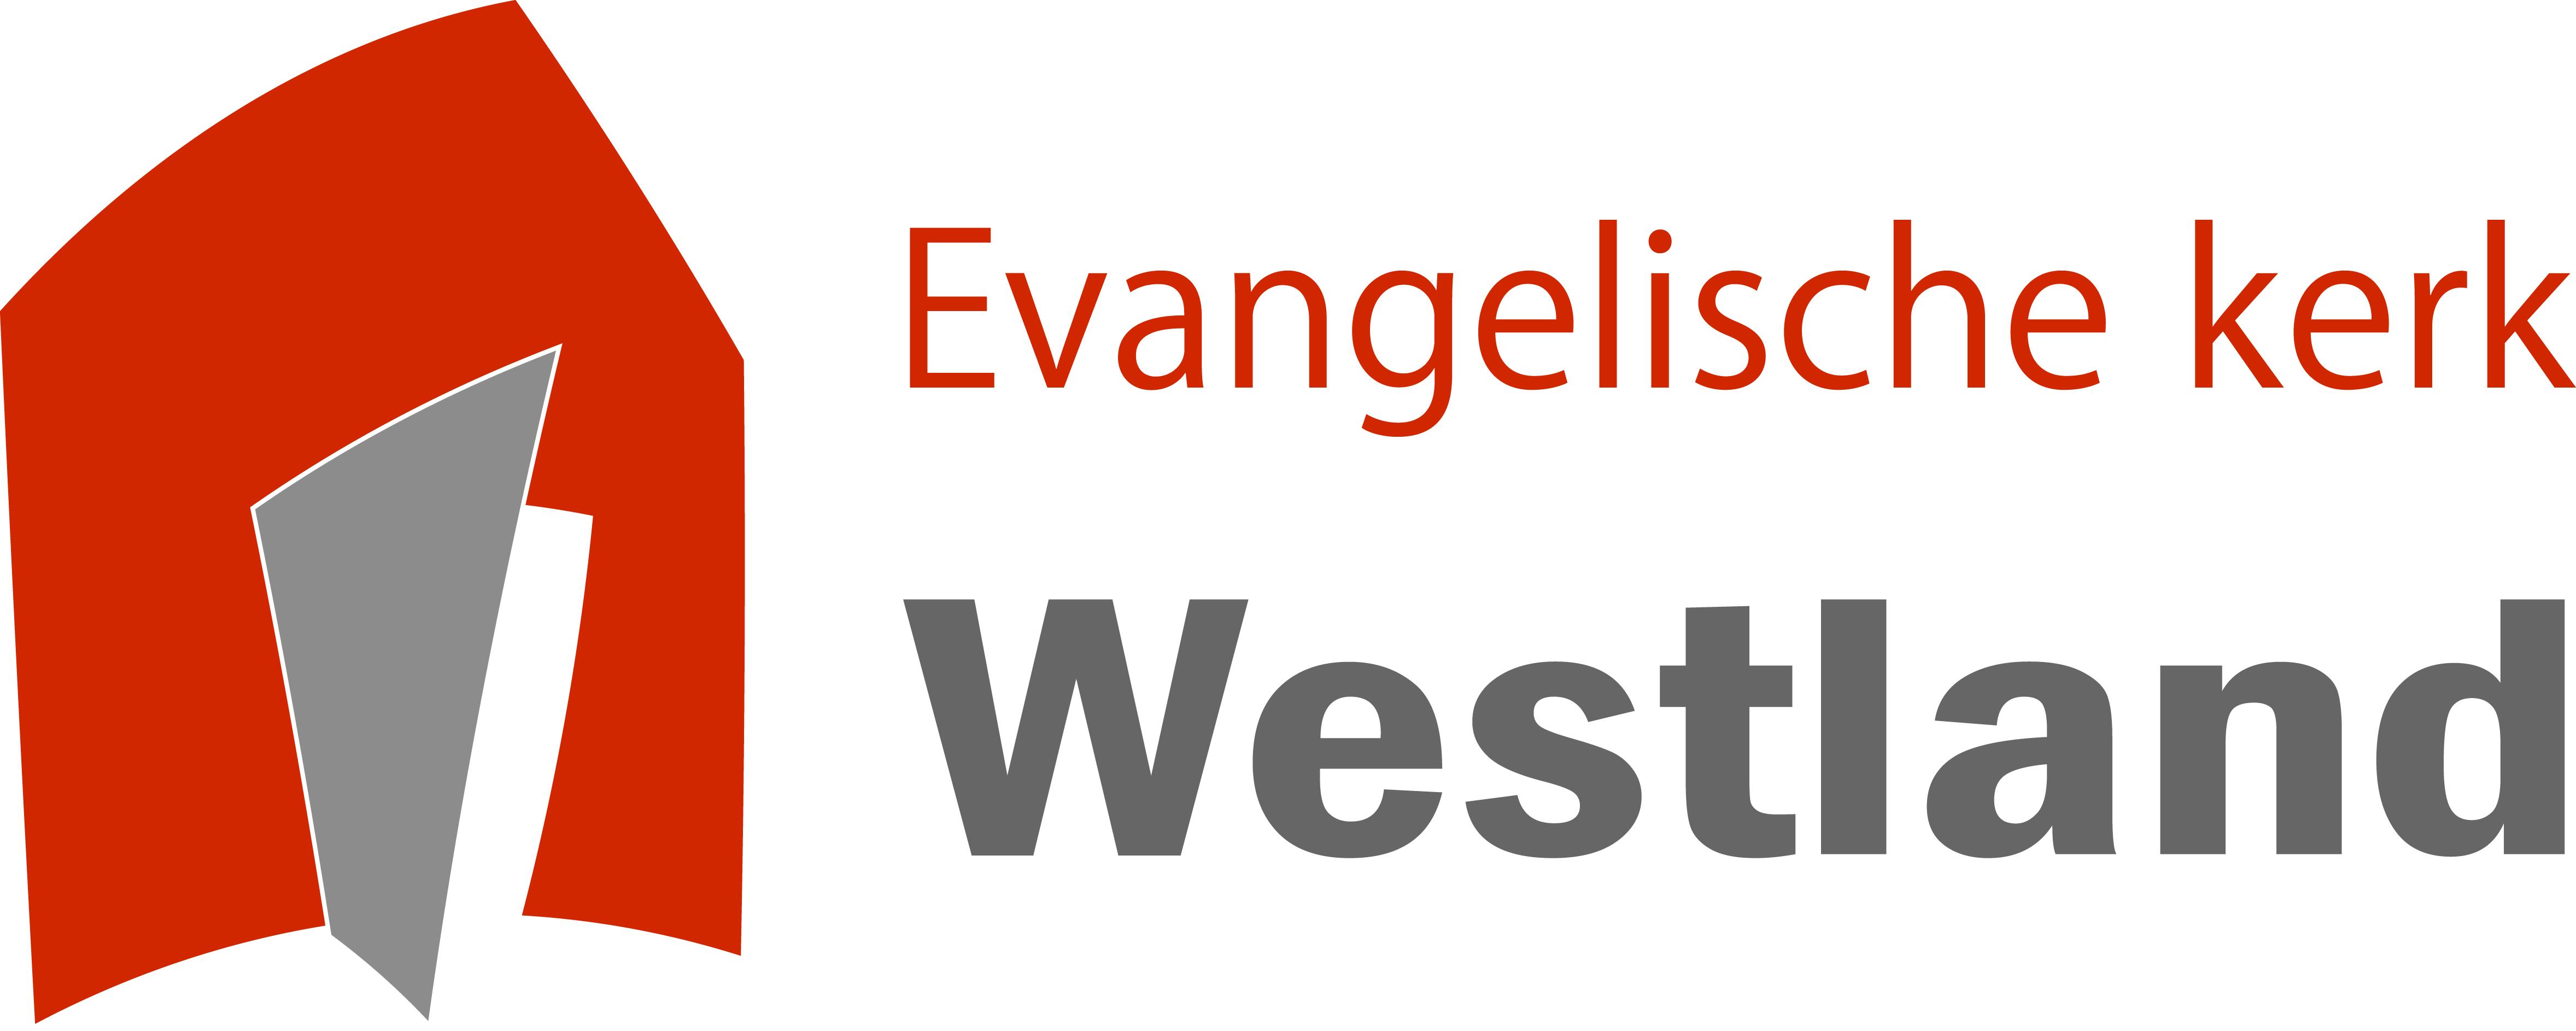 Logo Evangelische kerk Westland